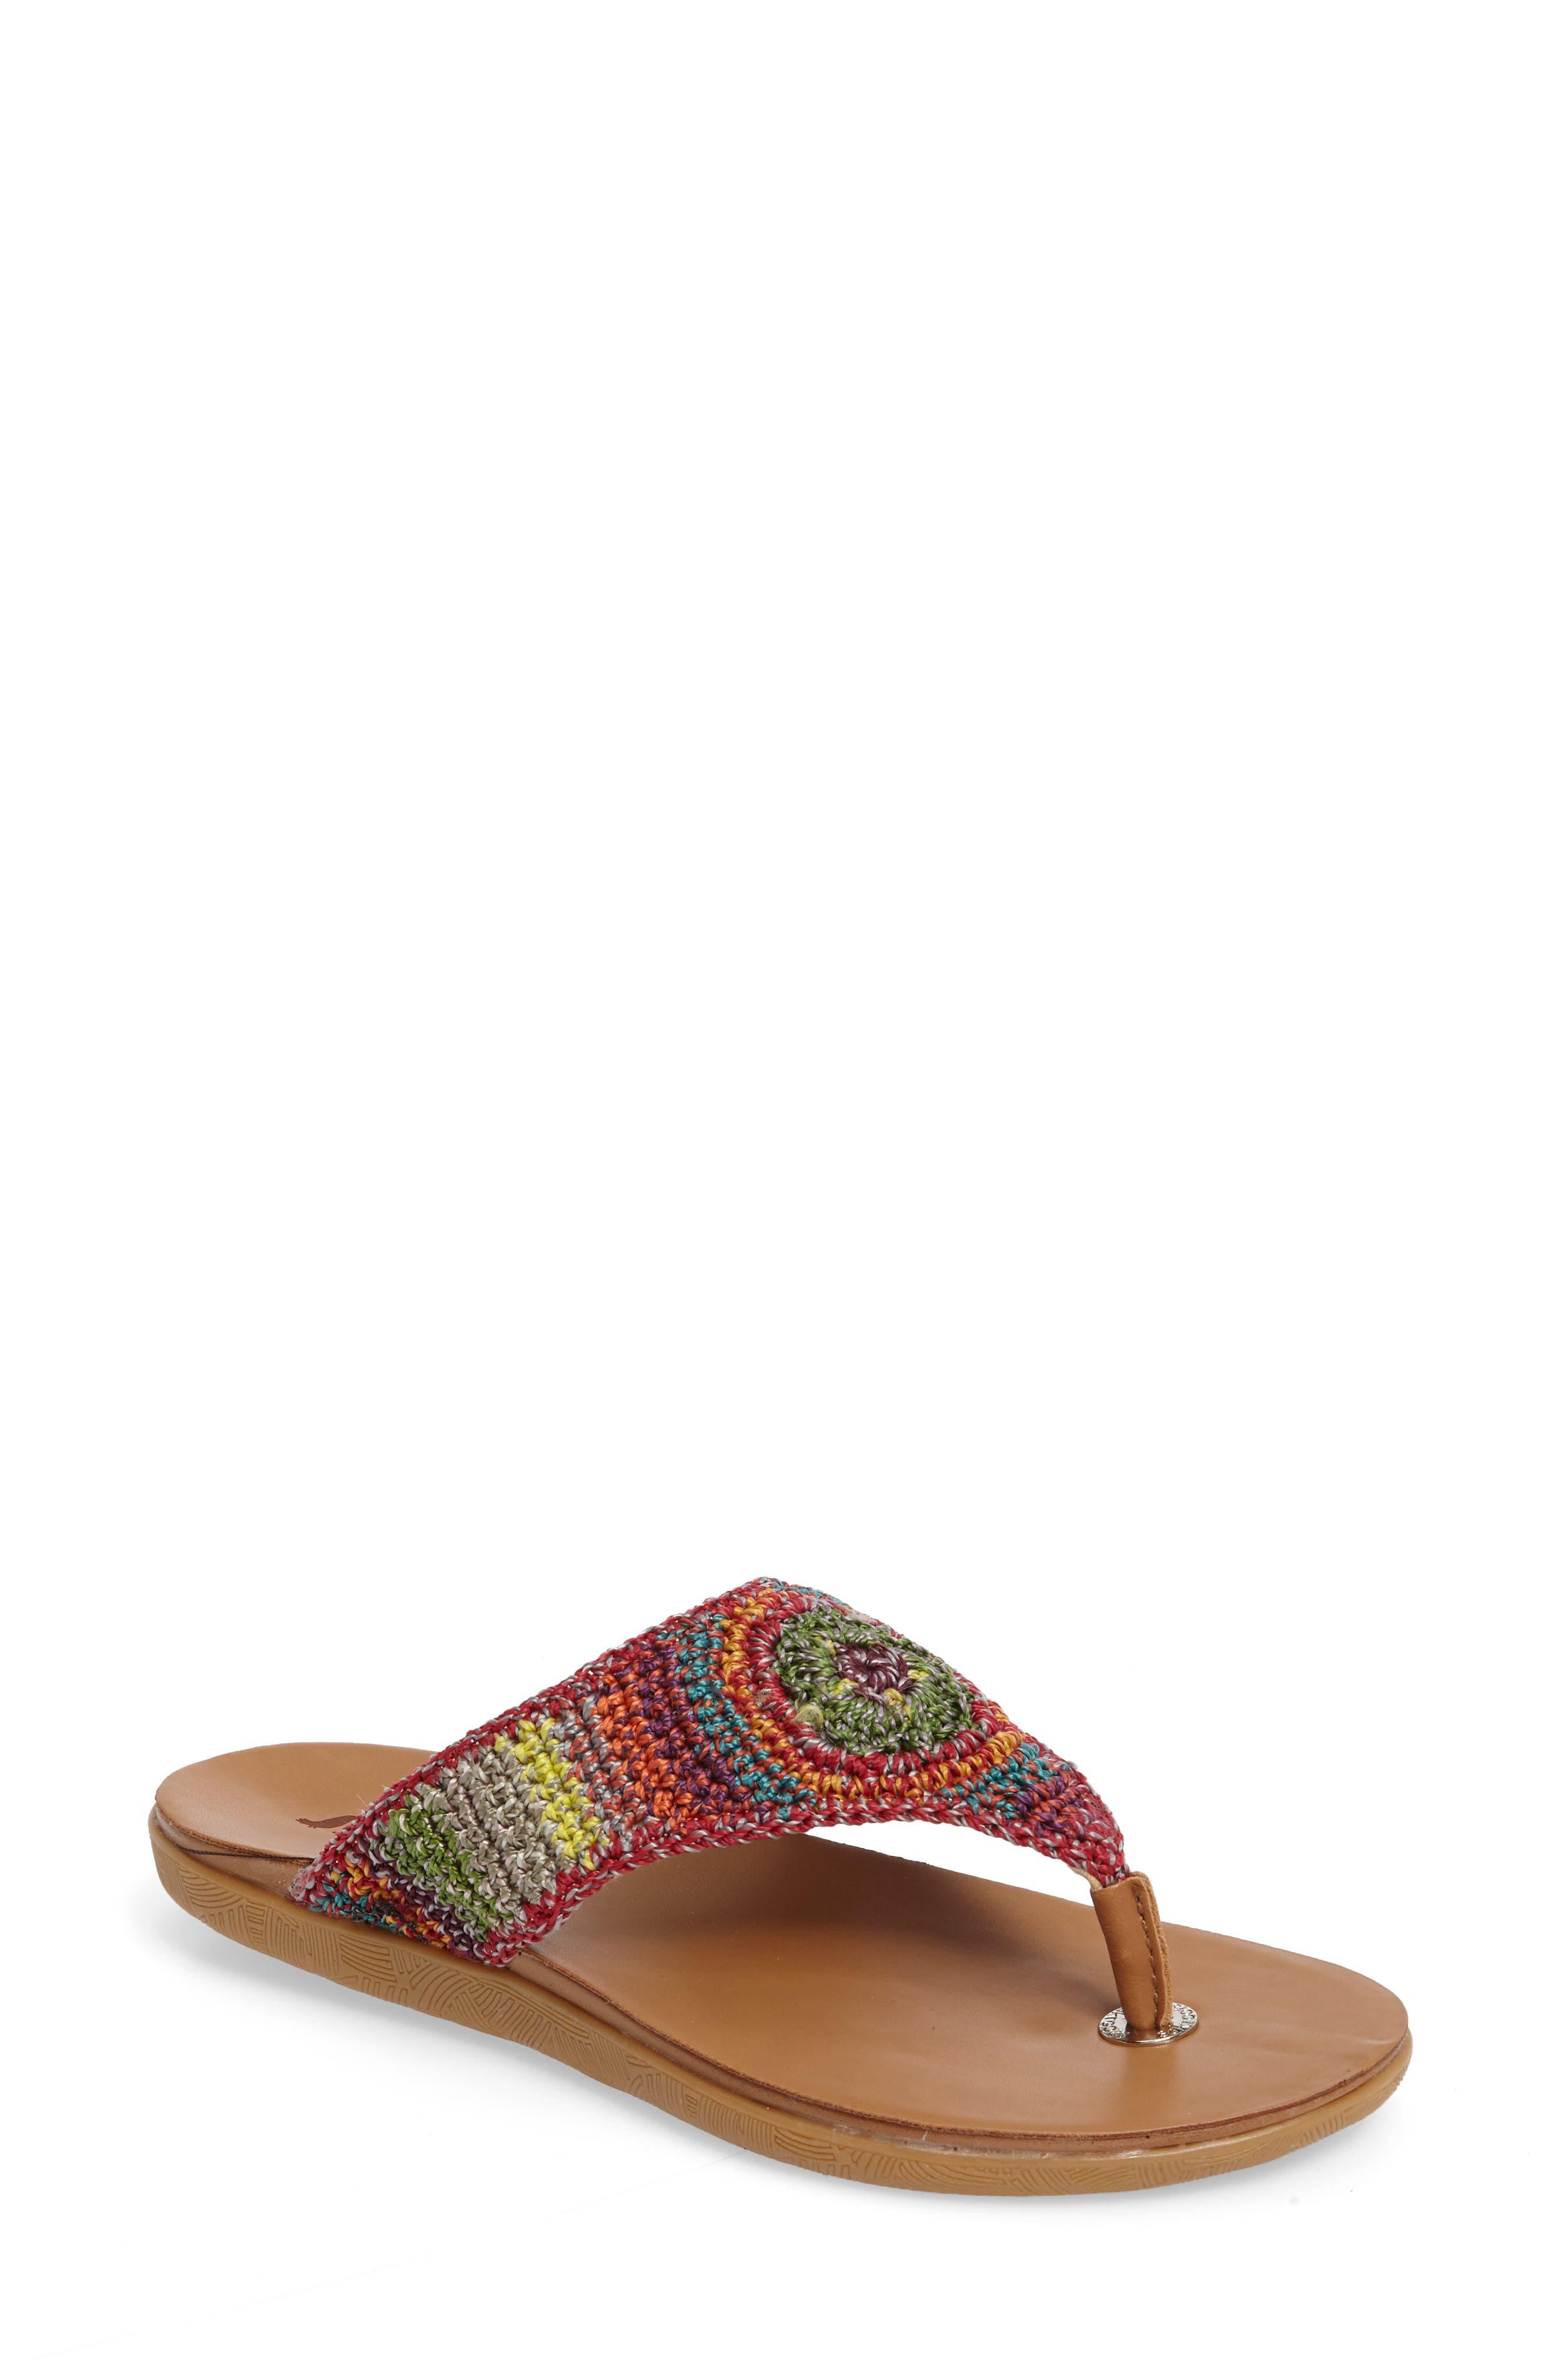 Main Image - Sakroots Sarria Flip Flop (Women)